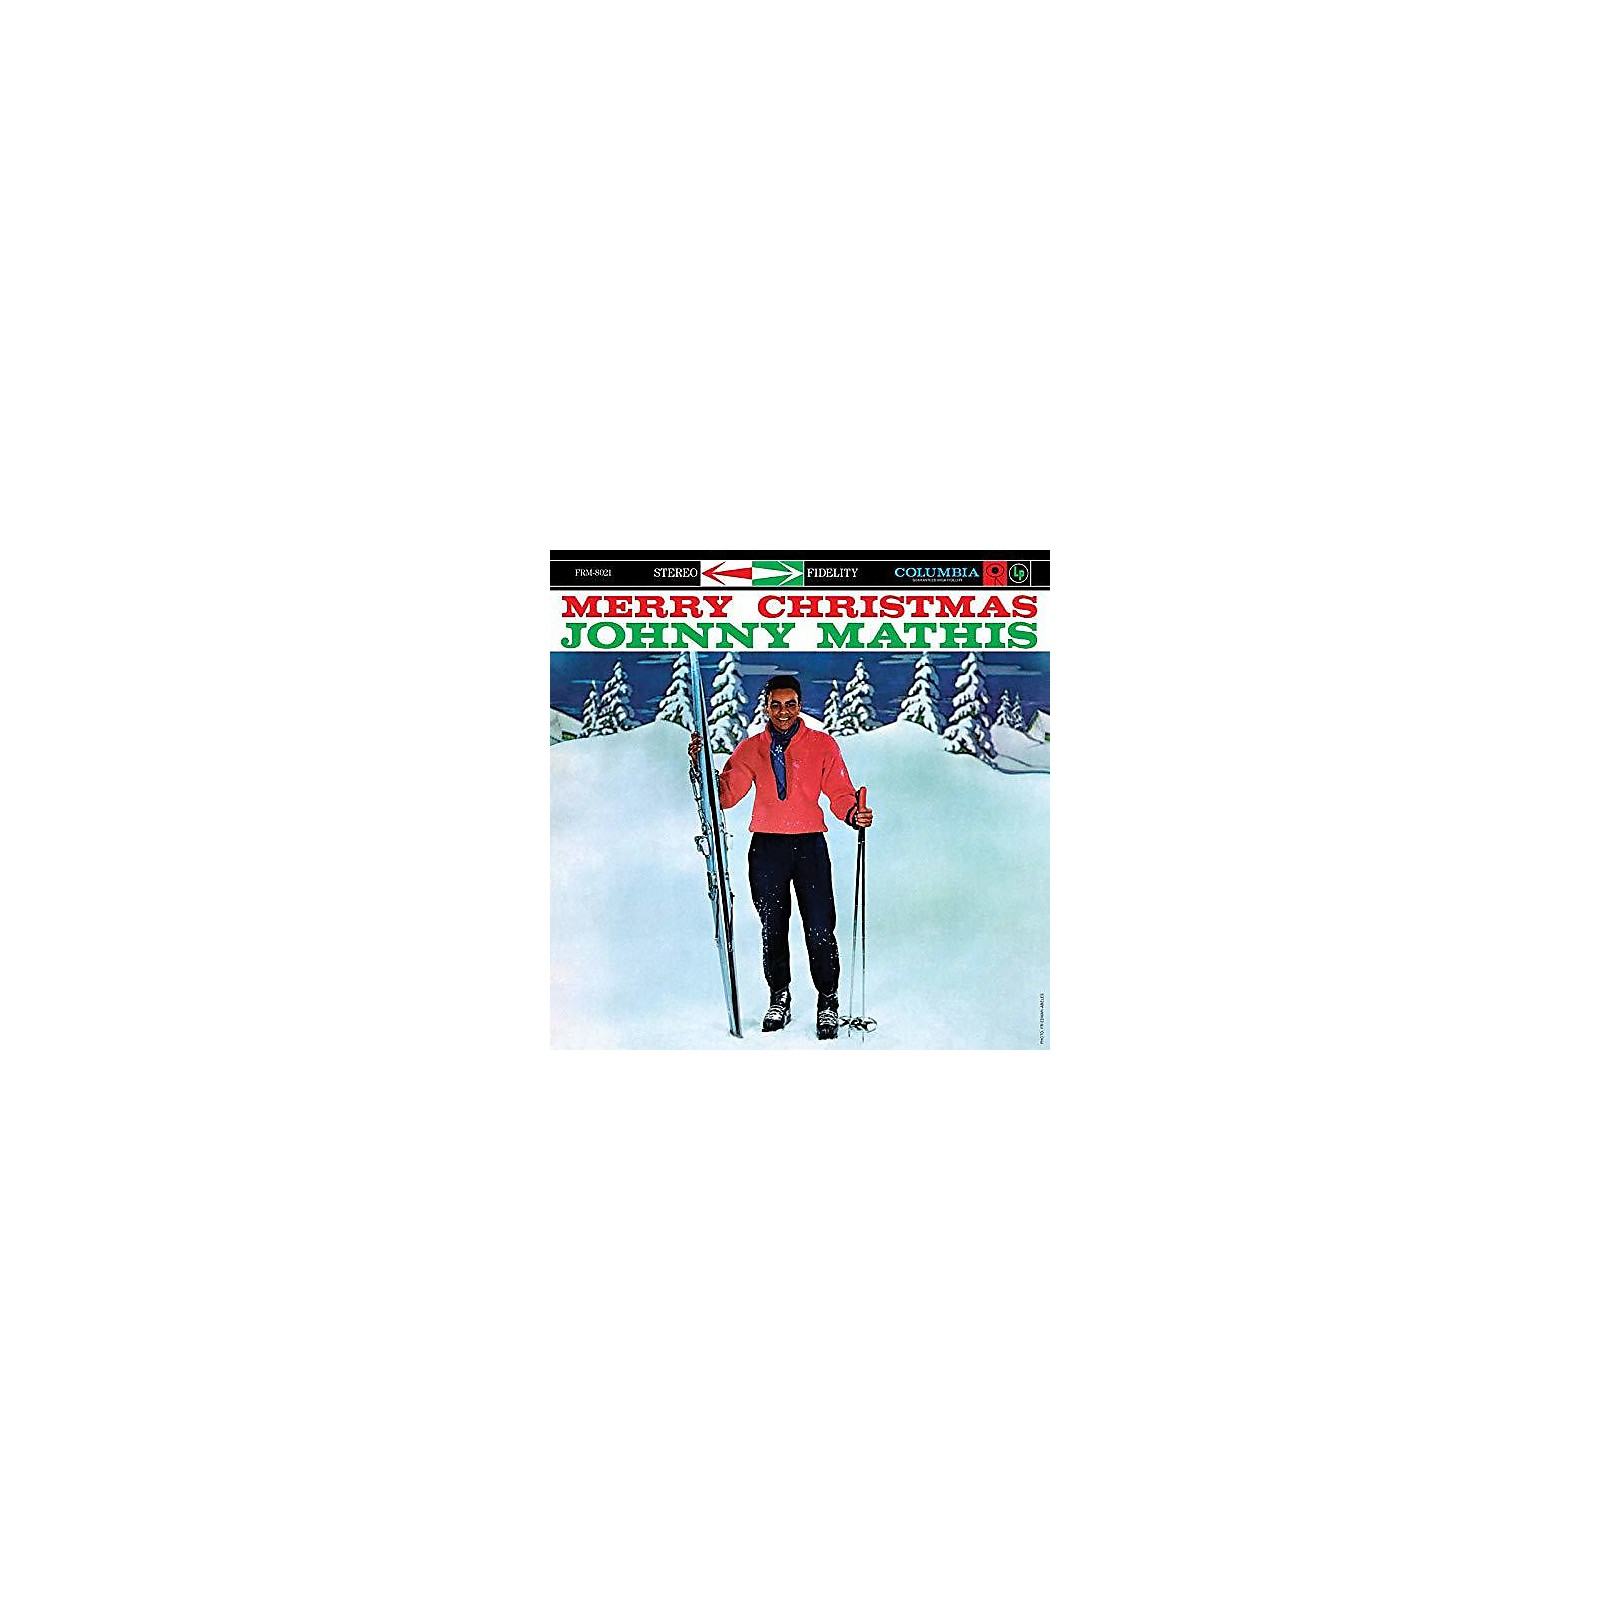 Alliance Johnny Mathis - Merry Christmas